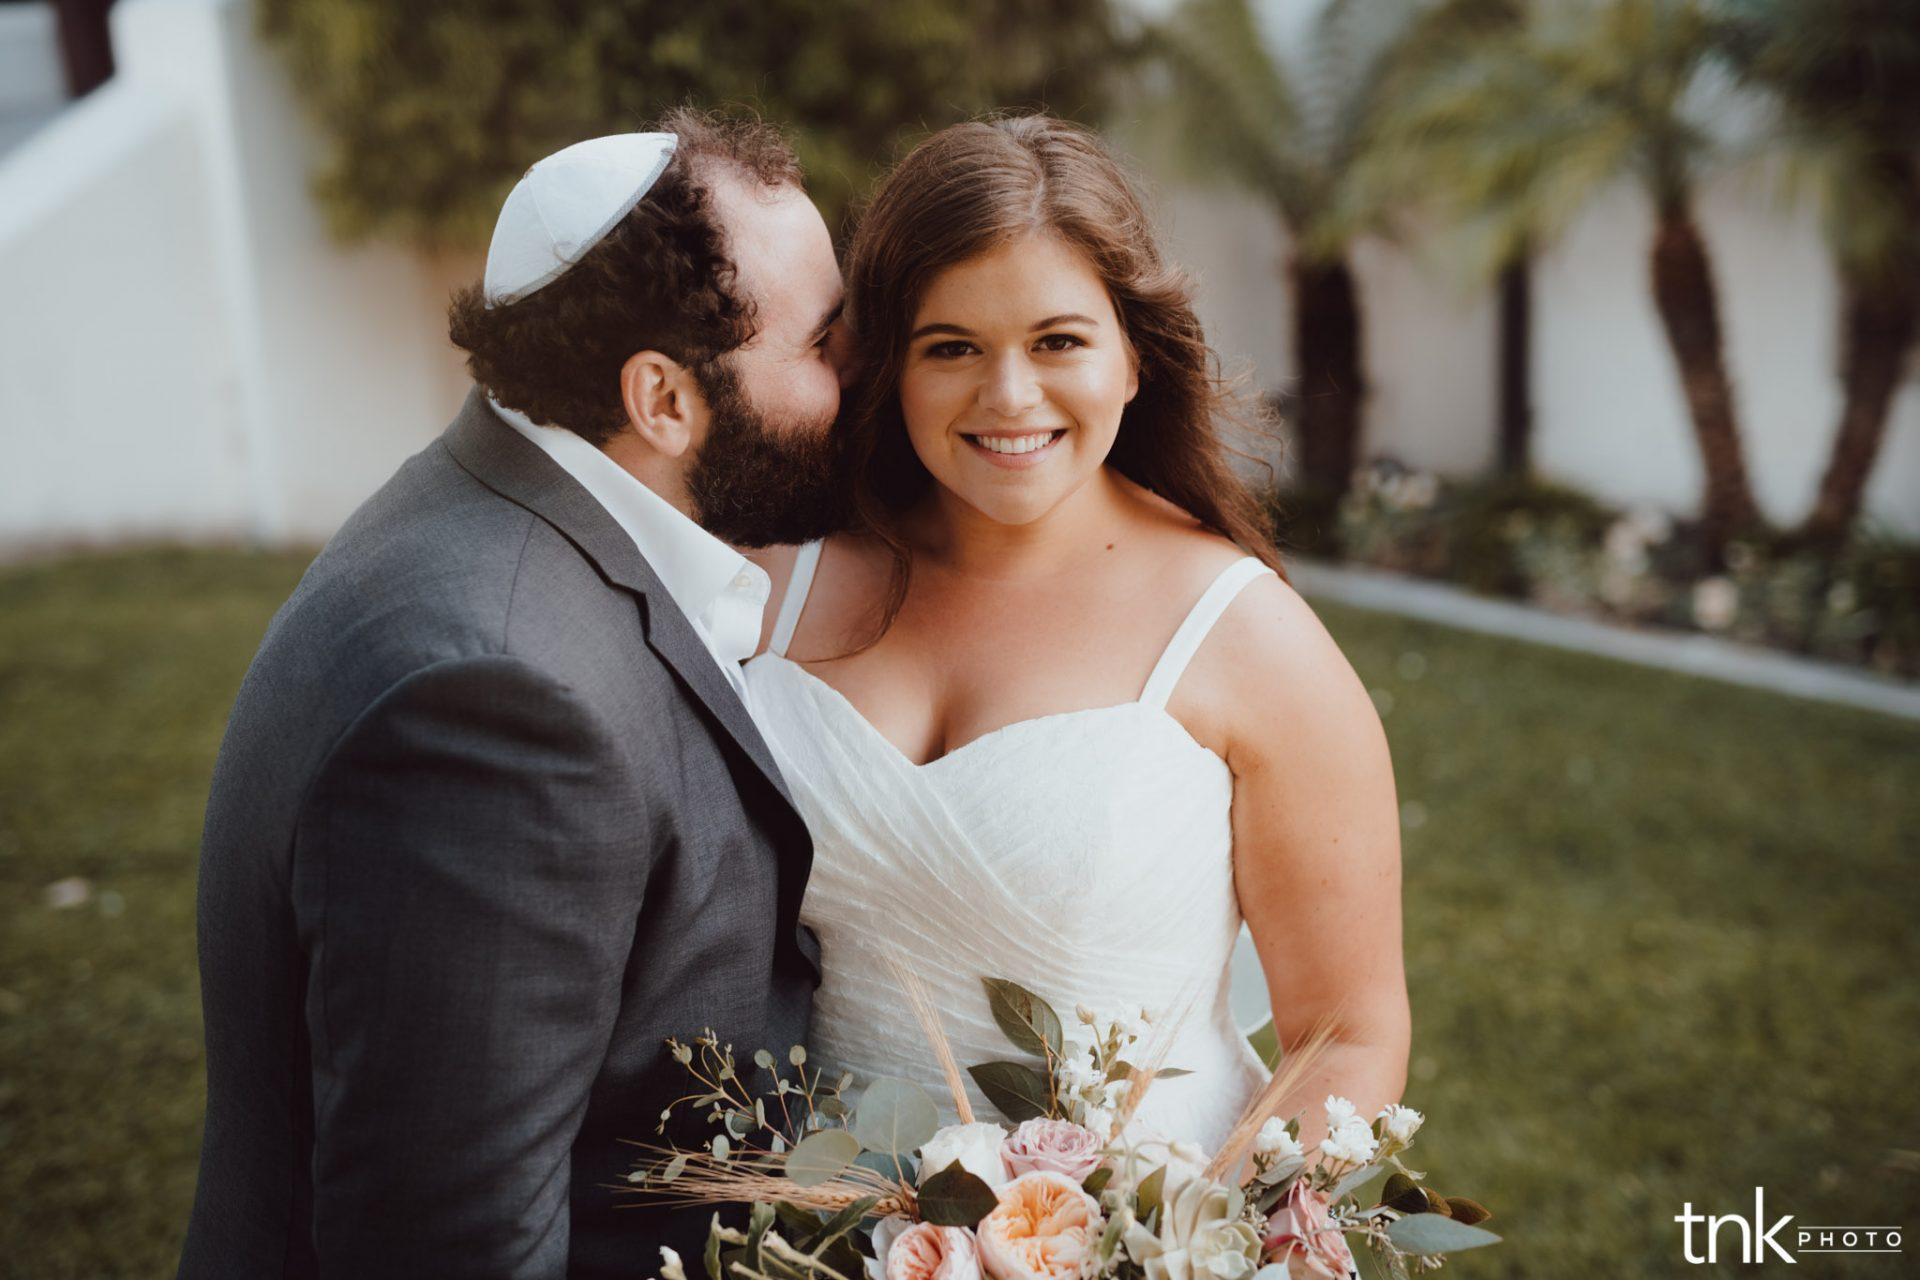 Redondo Beach Historic Library Wedding | Marysa and Hershel